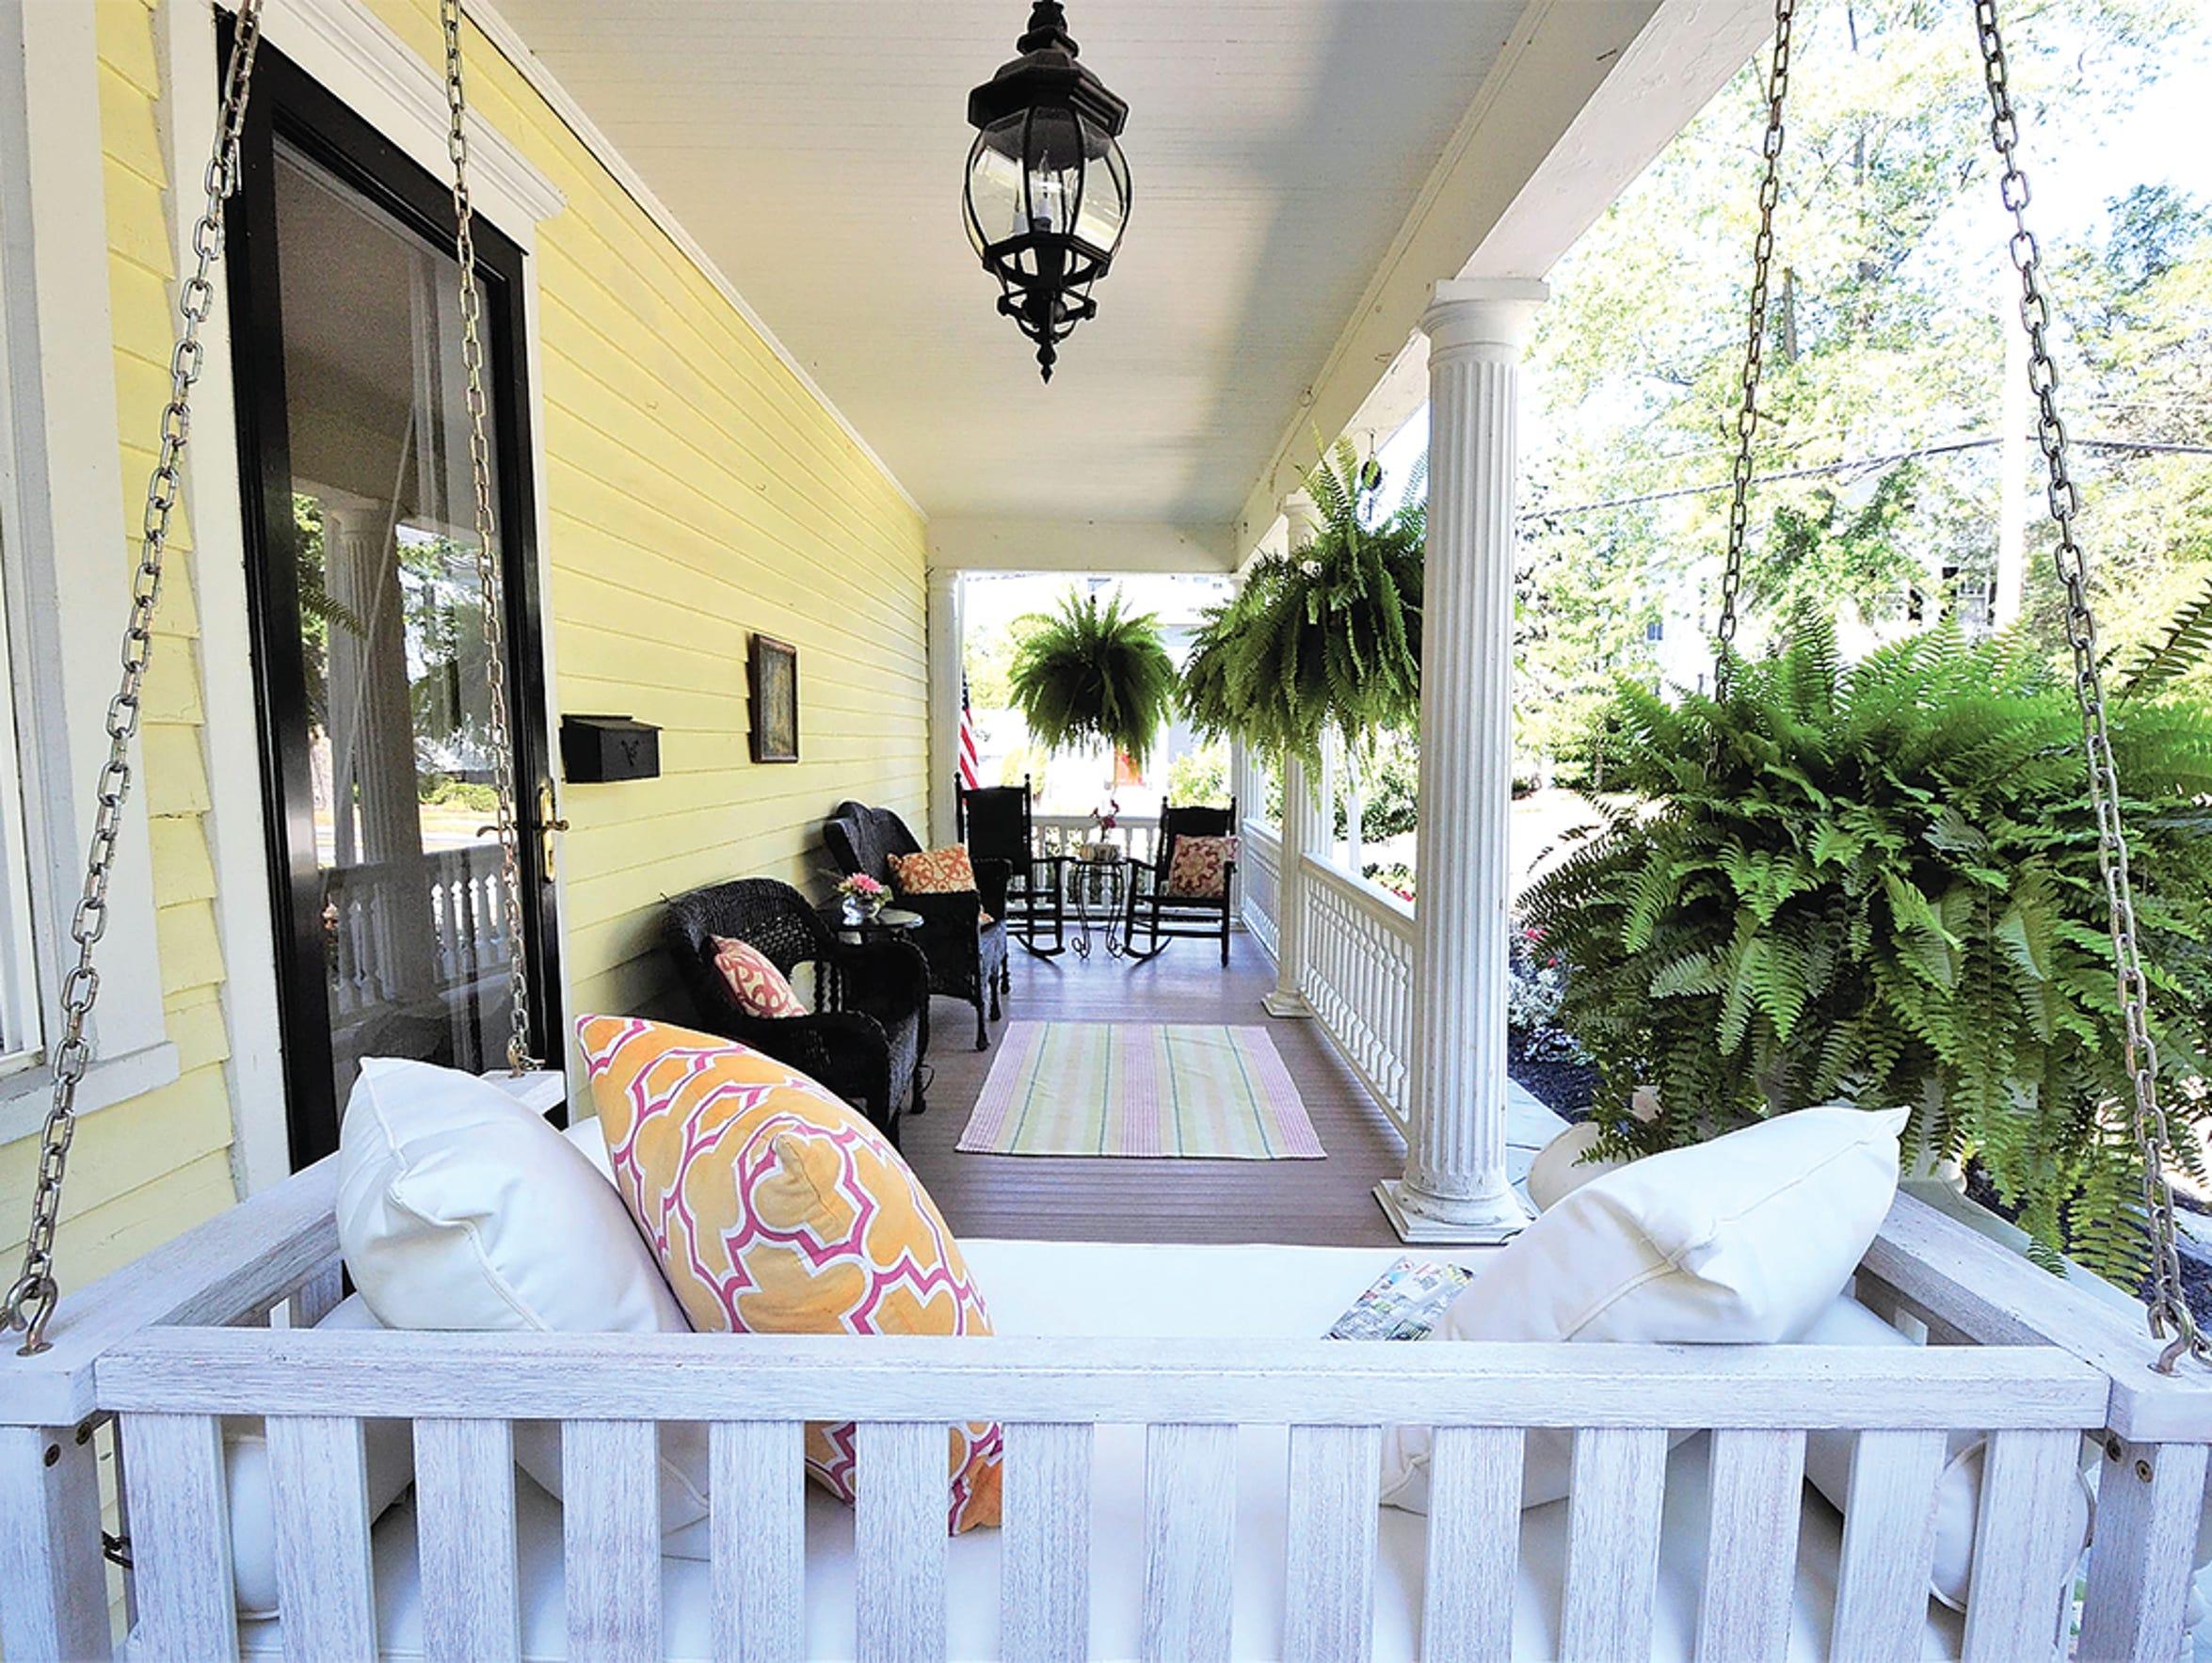 34 State: Historic Luxury Suites in Skaneateles.